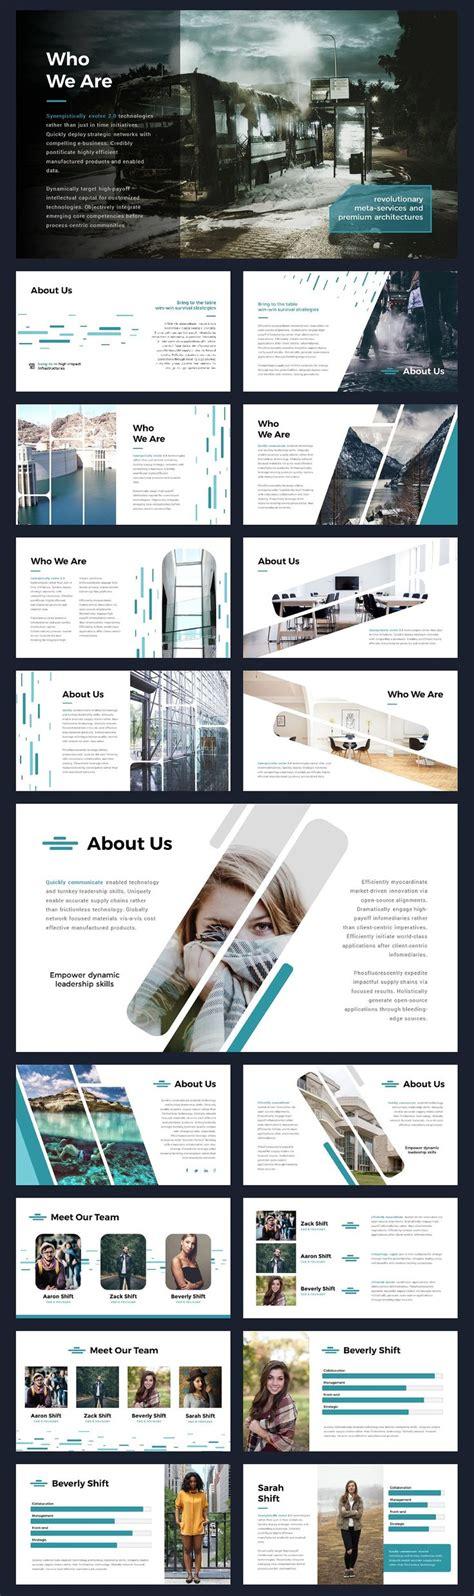 templates for scientific poster presentation poster design